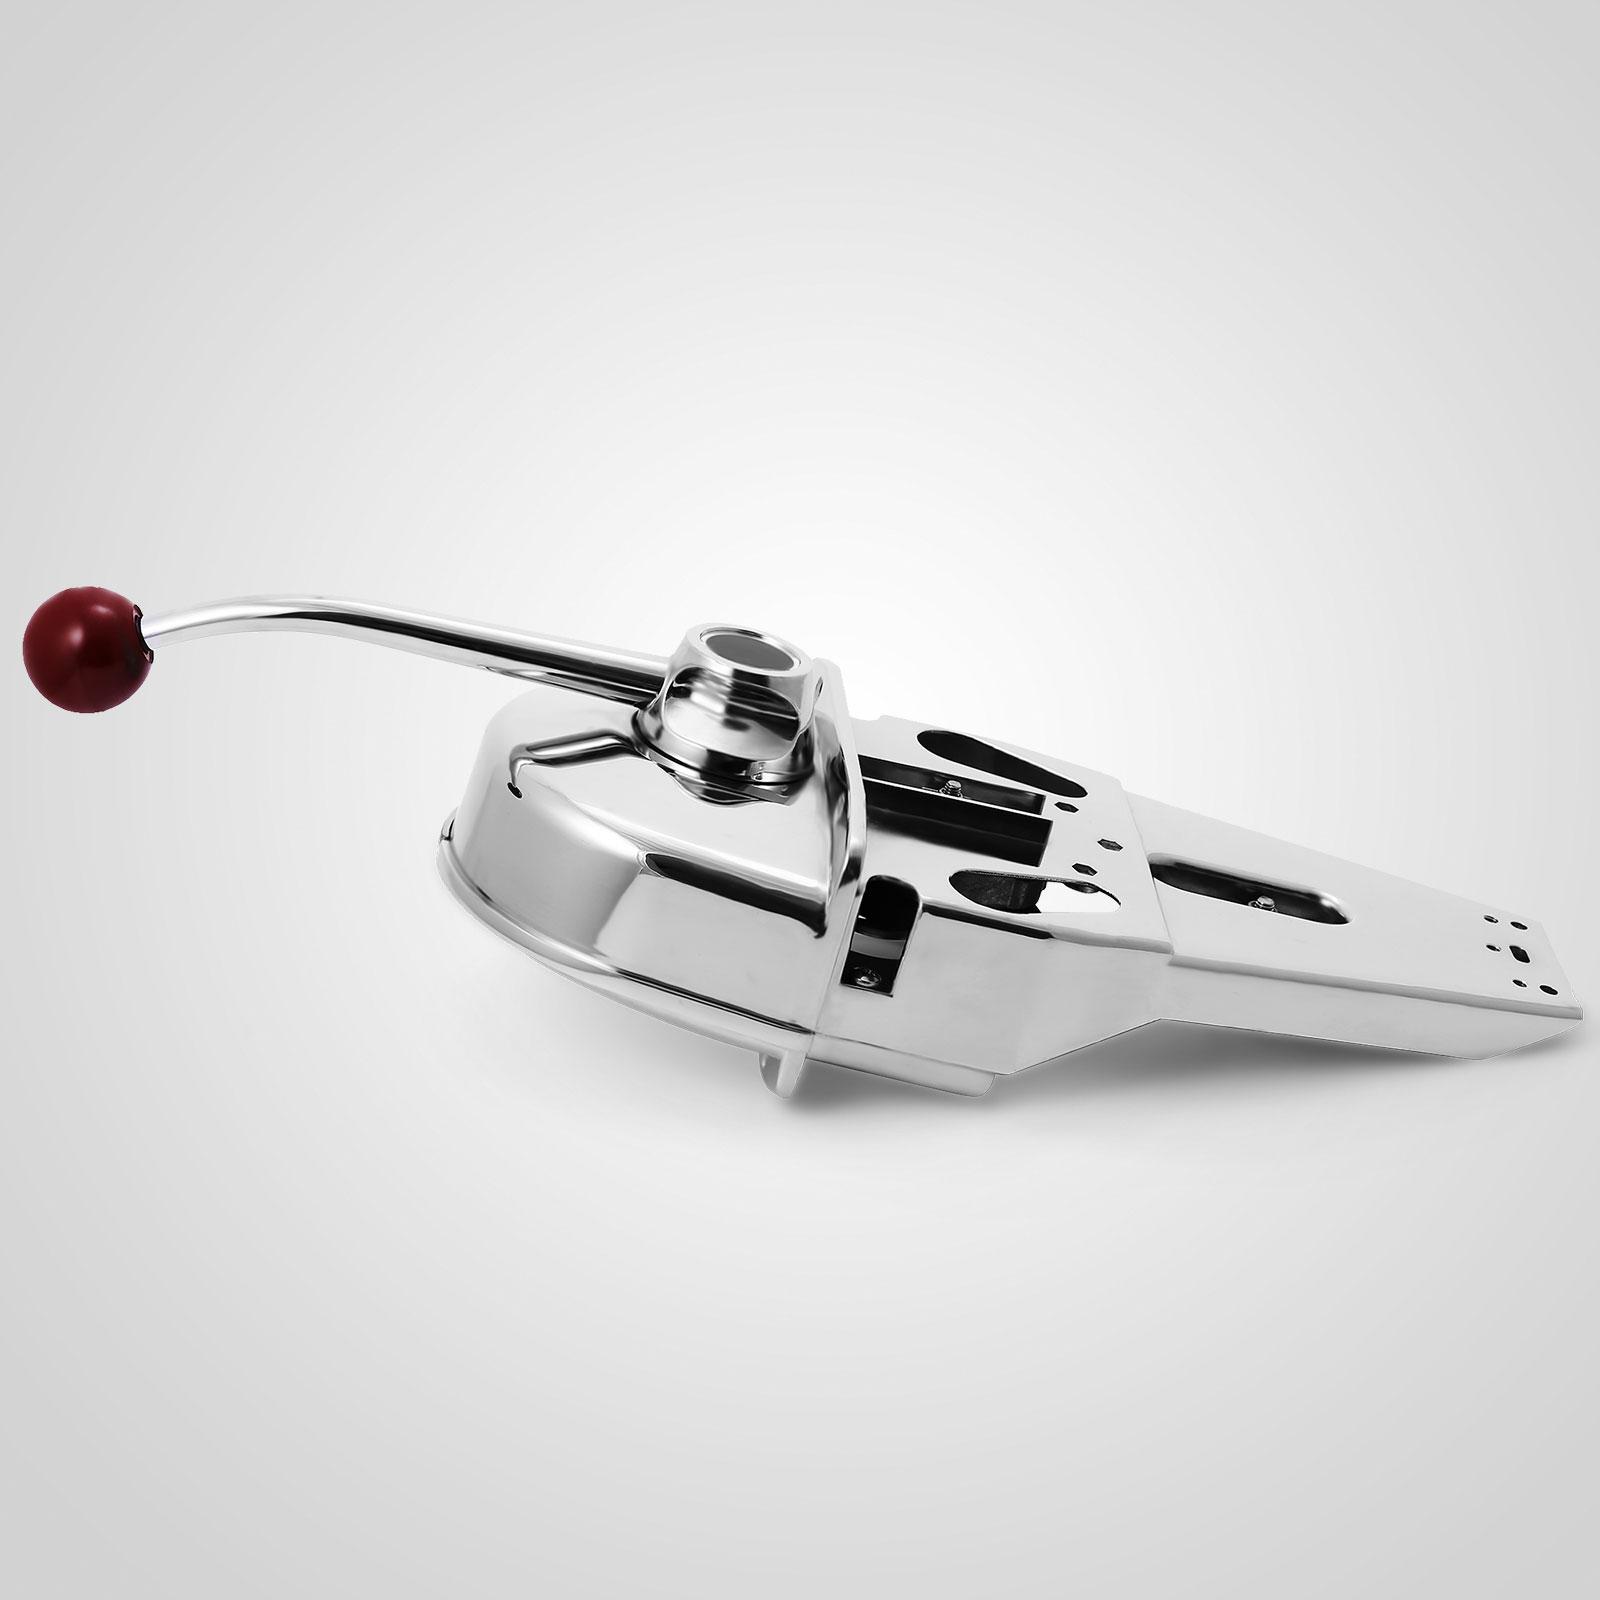 Single Lever Throttle Marine : Universal top mount marine boat single lever handle engine